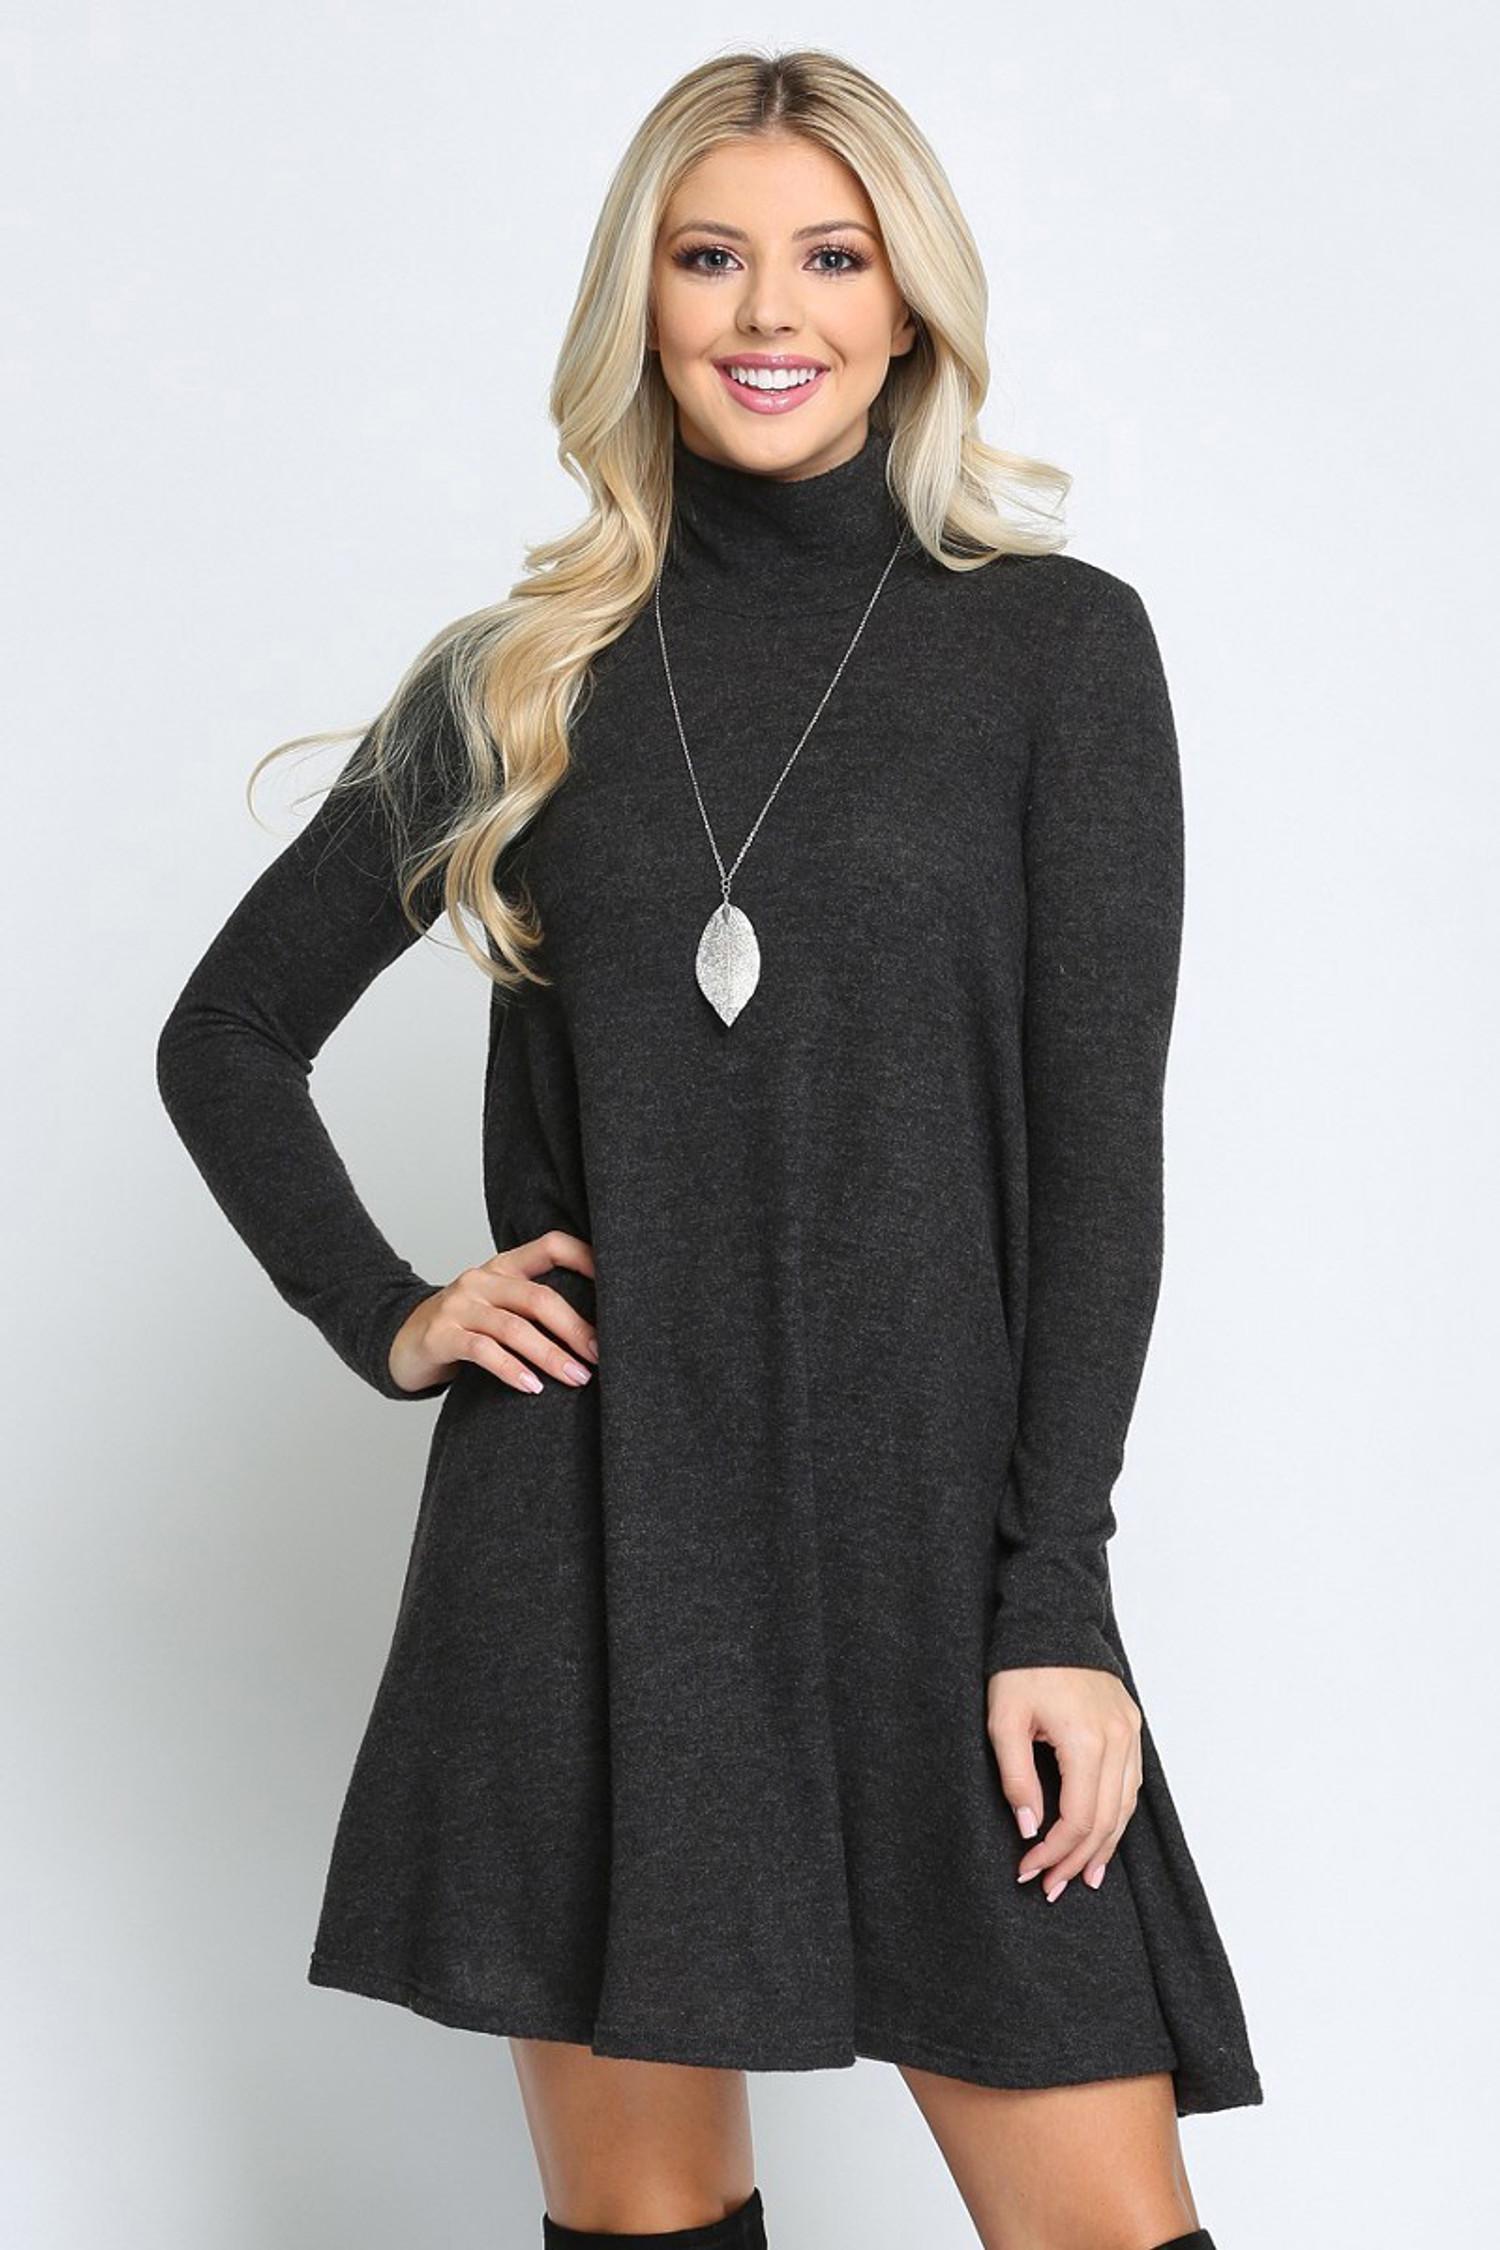 Charcoal Long Sleeve Hacci Knit Mock Neck Plus Size Swing Dress